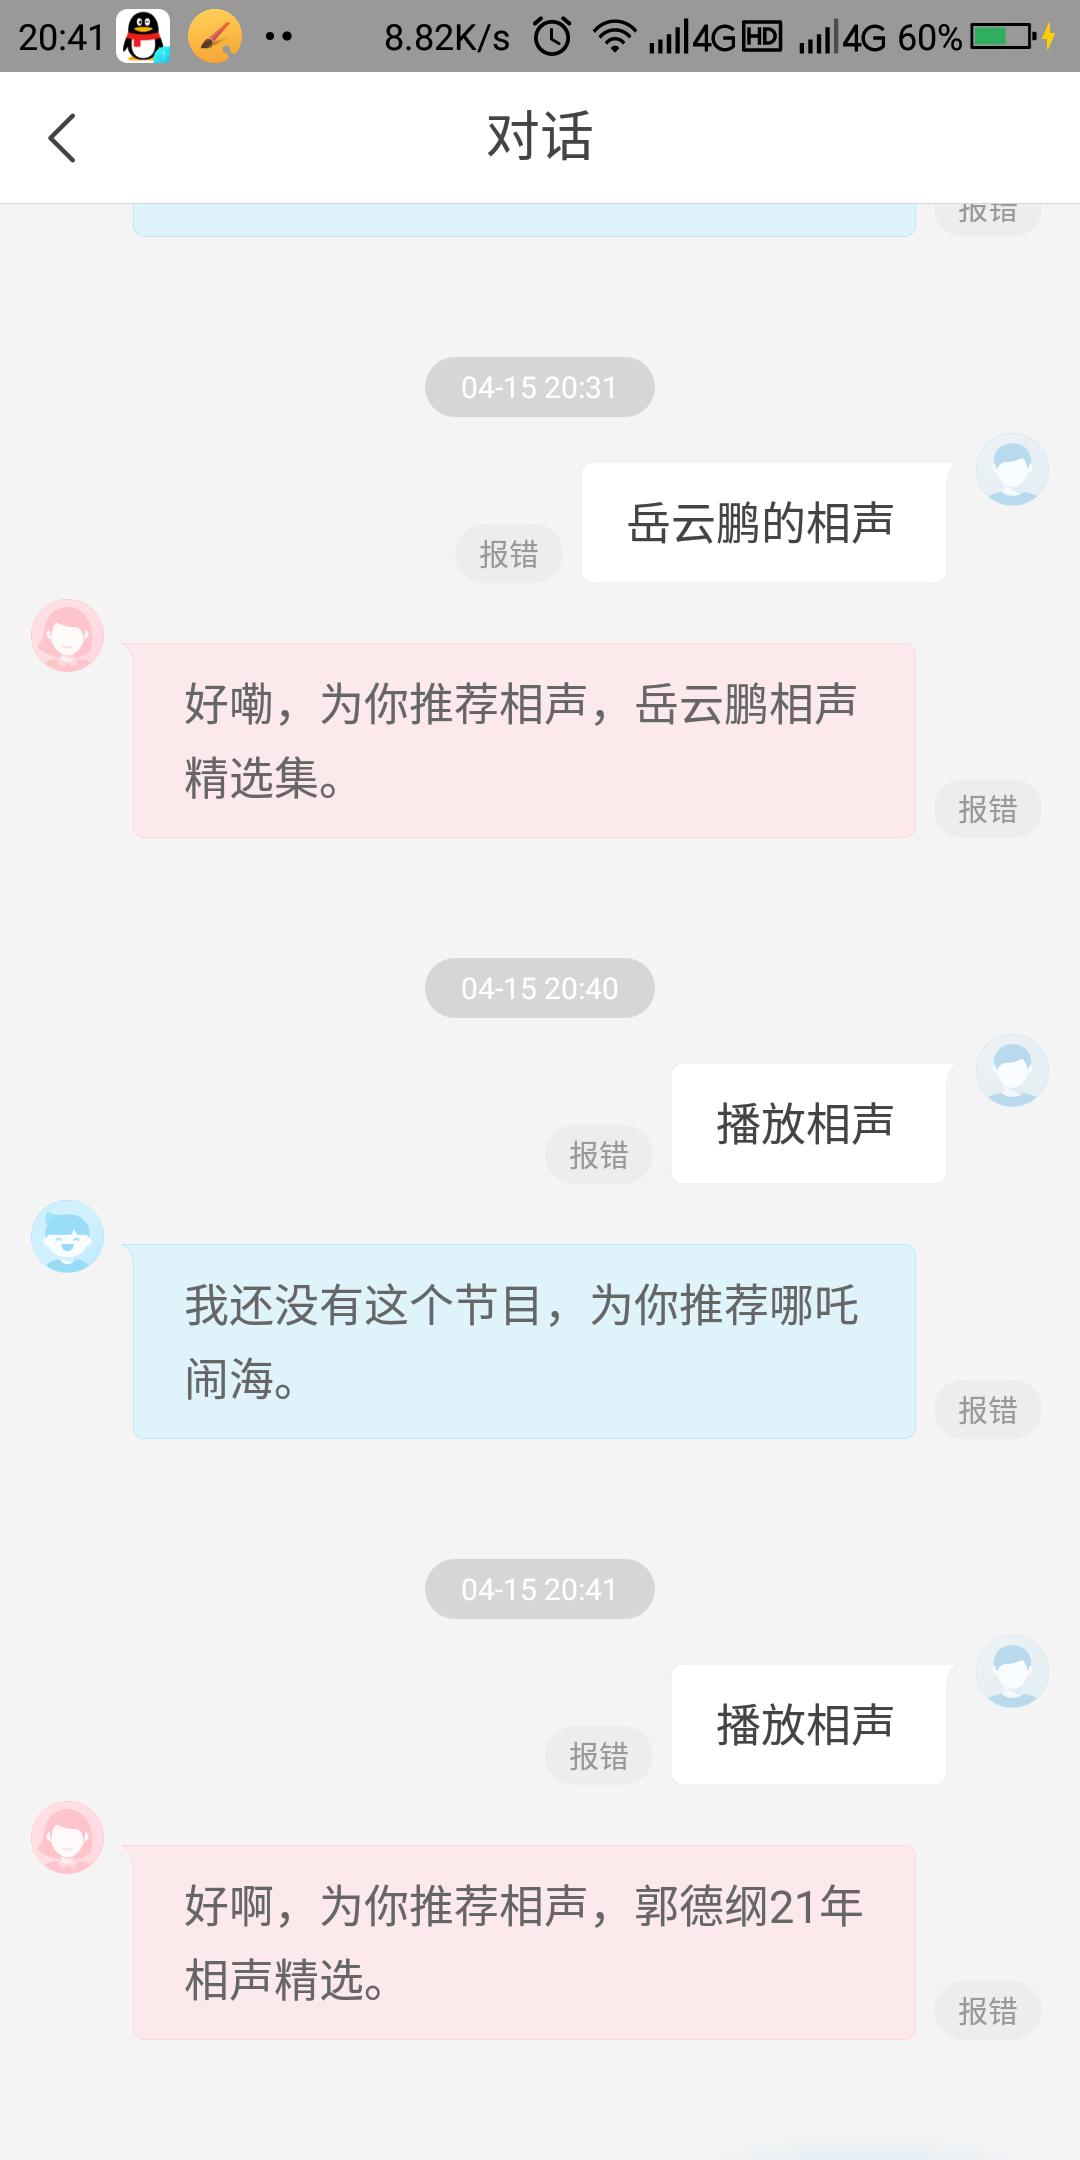 Screenshot_2019-04-15-20-41-47.png